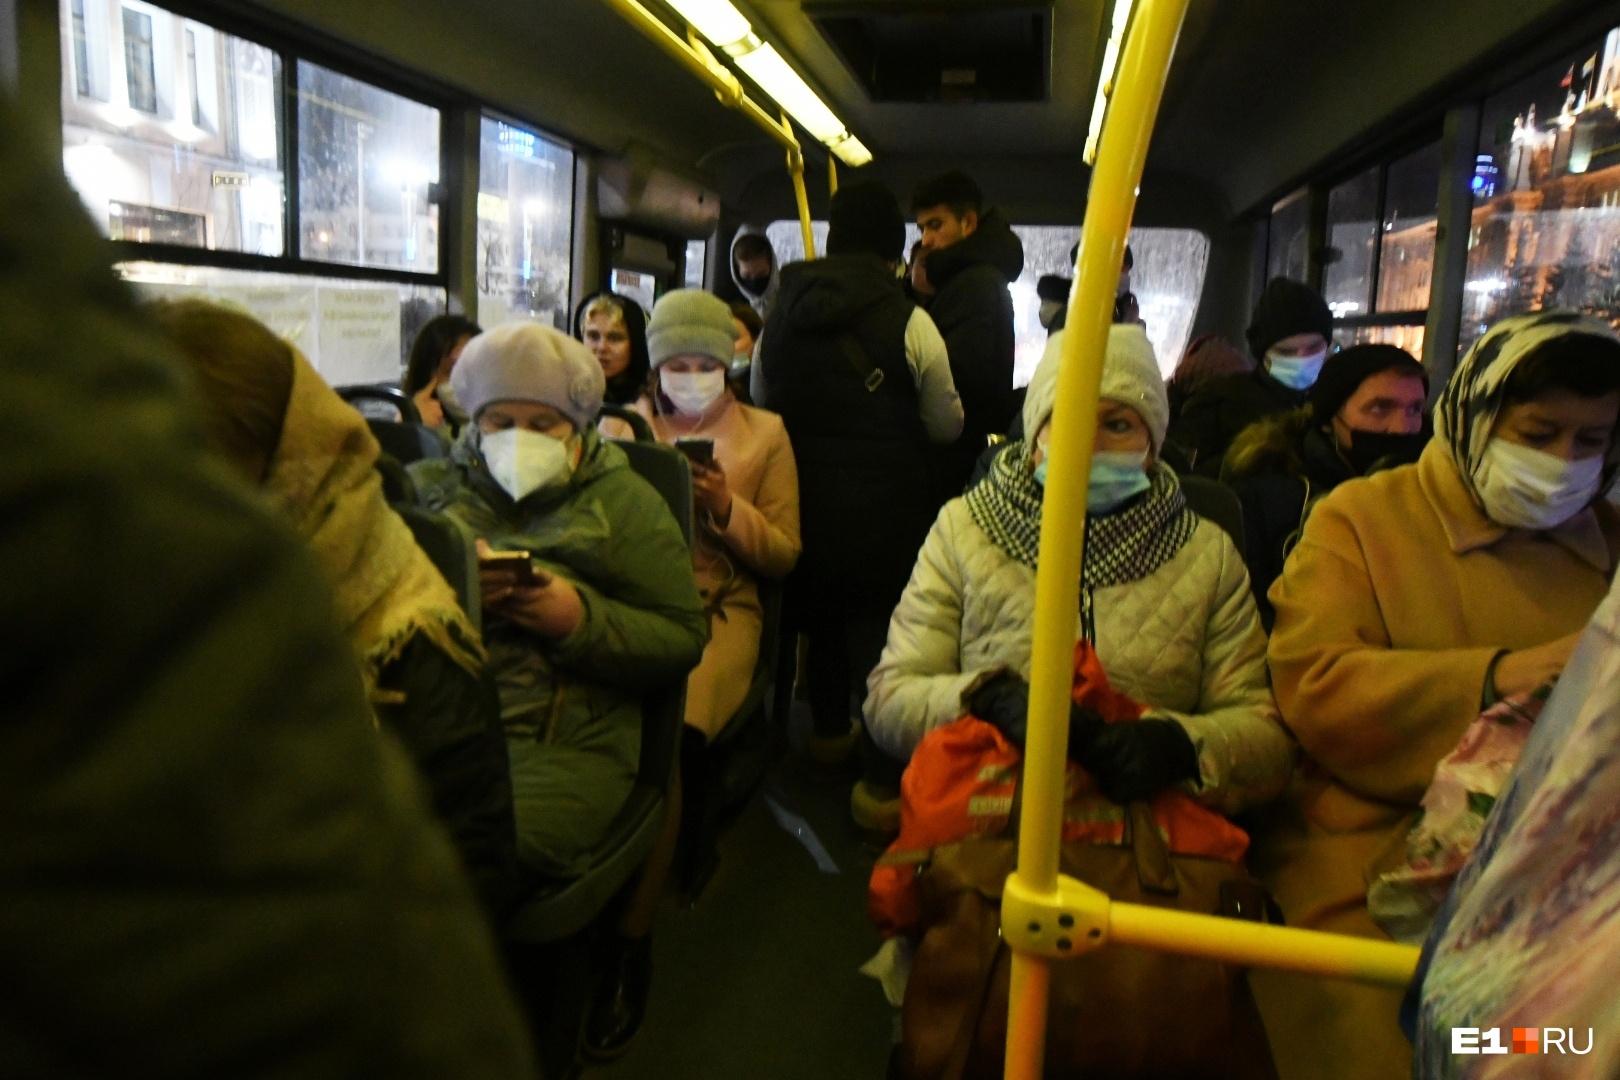 Почти все пассажиры носят маски в транспорте